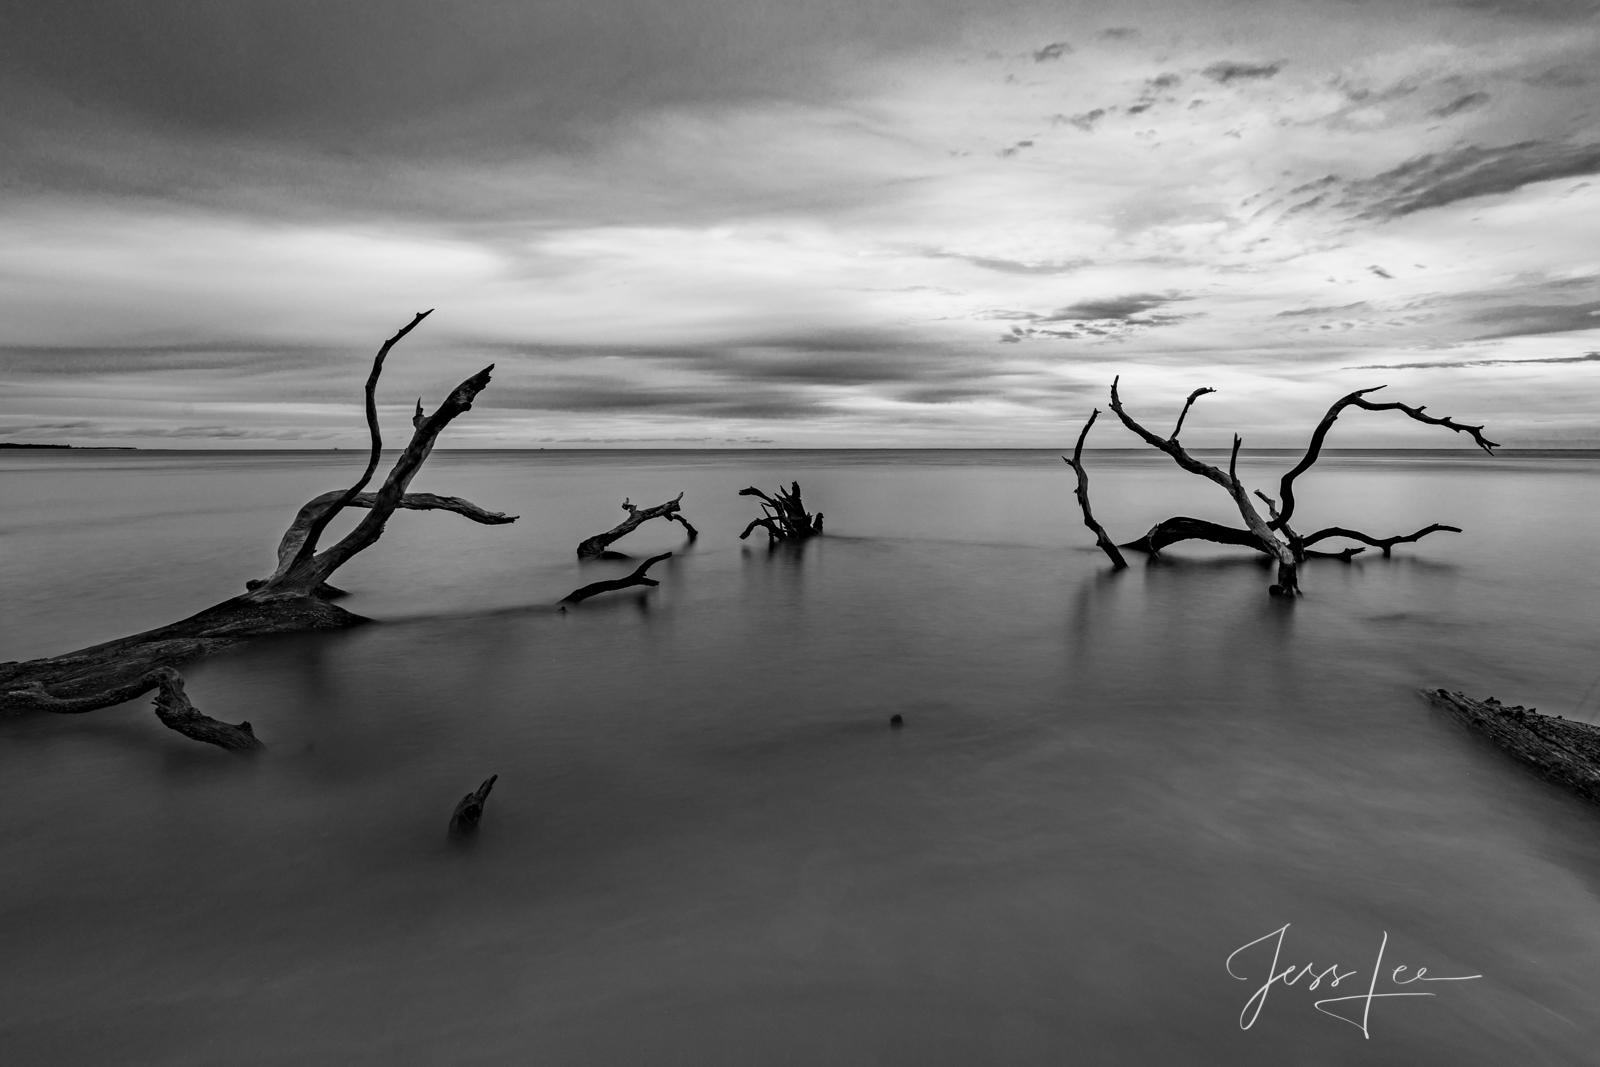 Ocean with dead trees